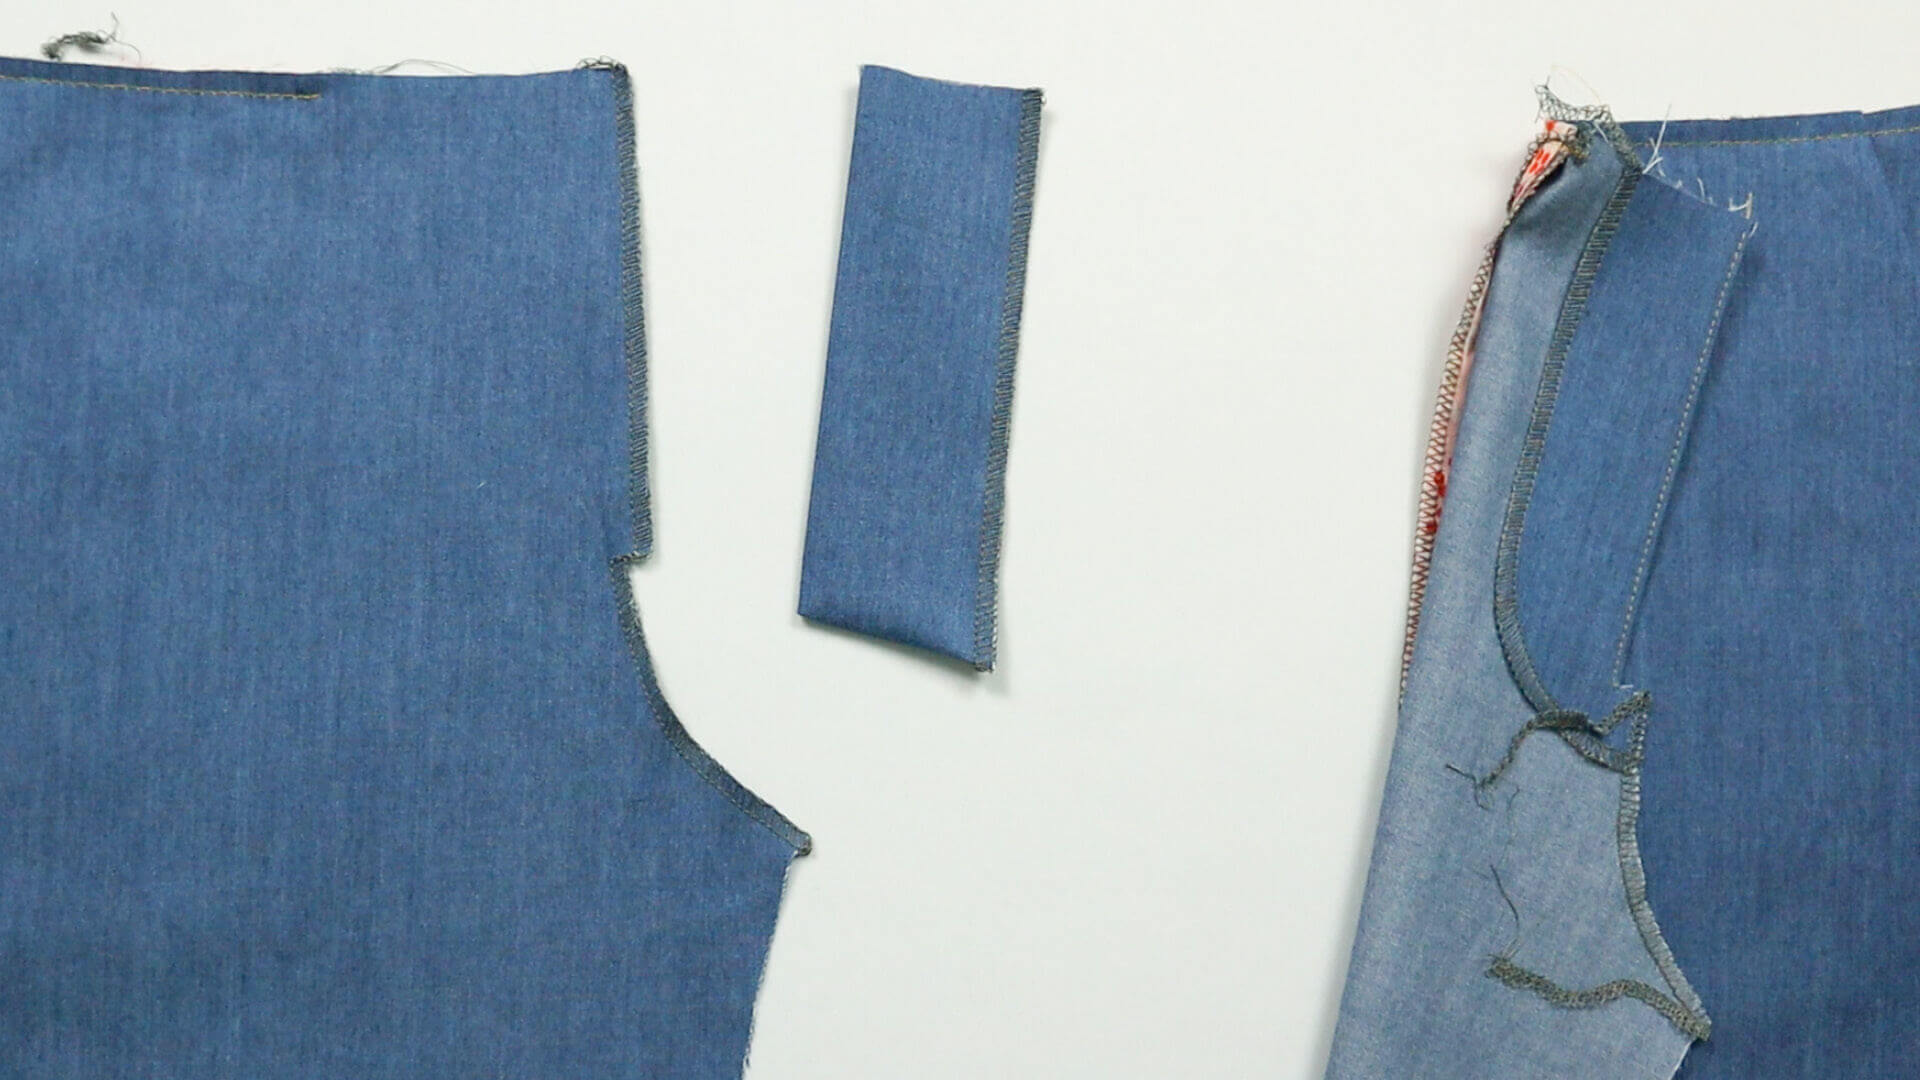 Hosenschlitz mit Reißverschluss selber nähen- mittels Overlock versäuberte Schnittkanten